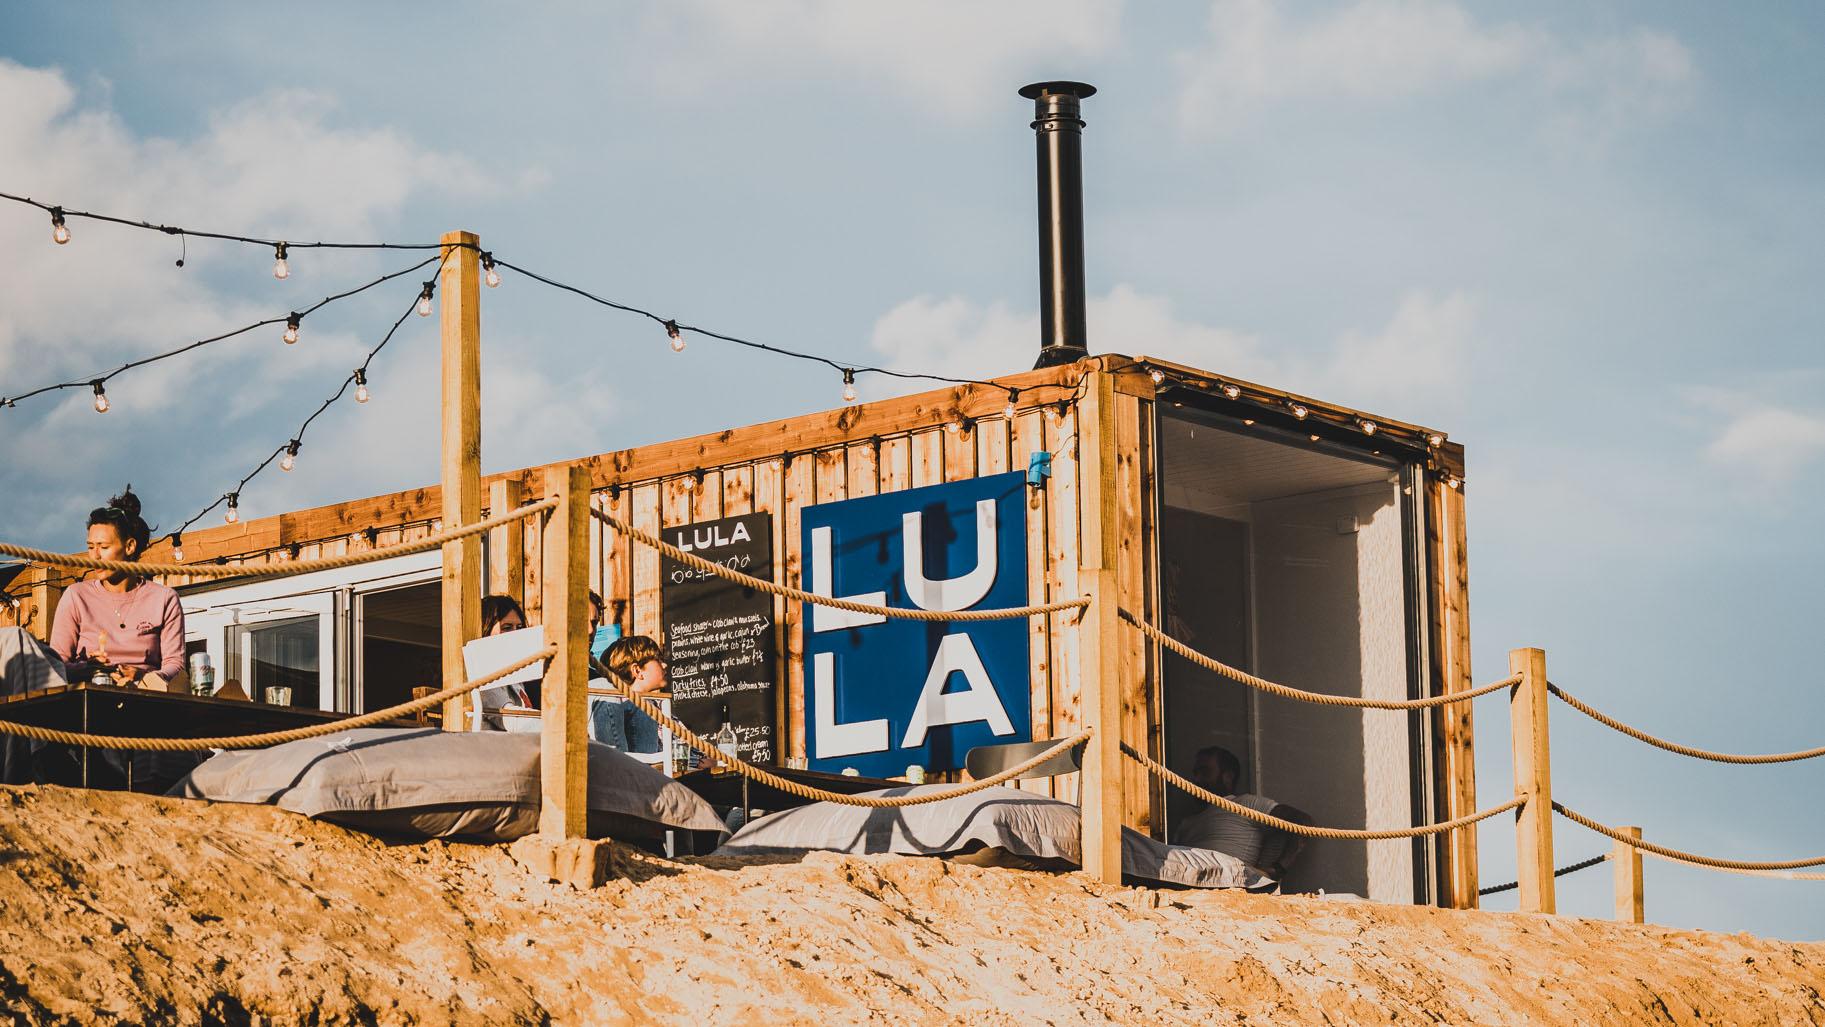 Lula shack